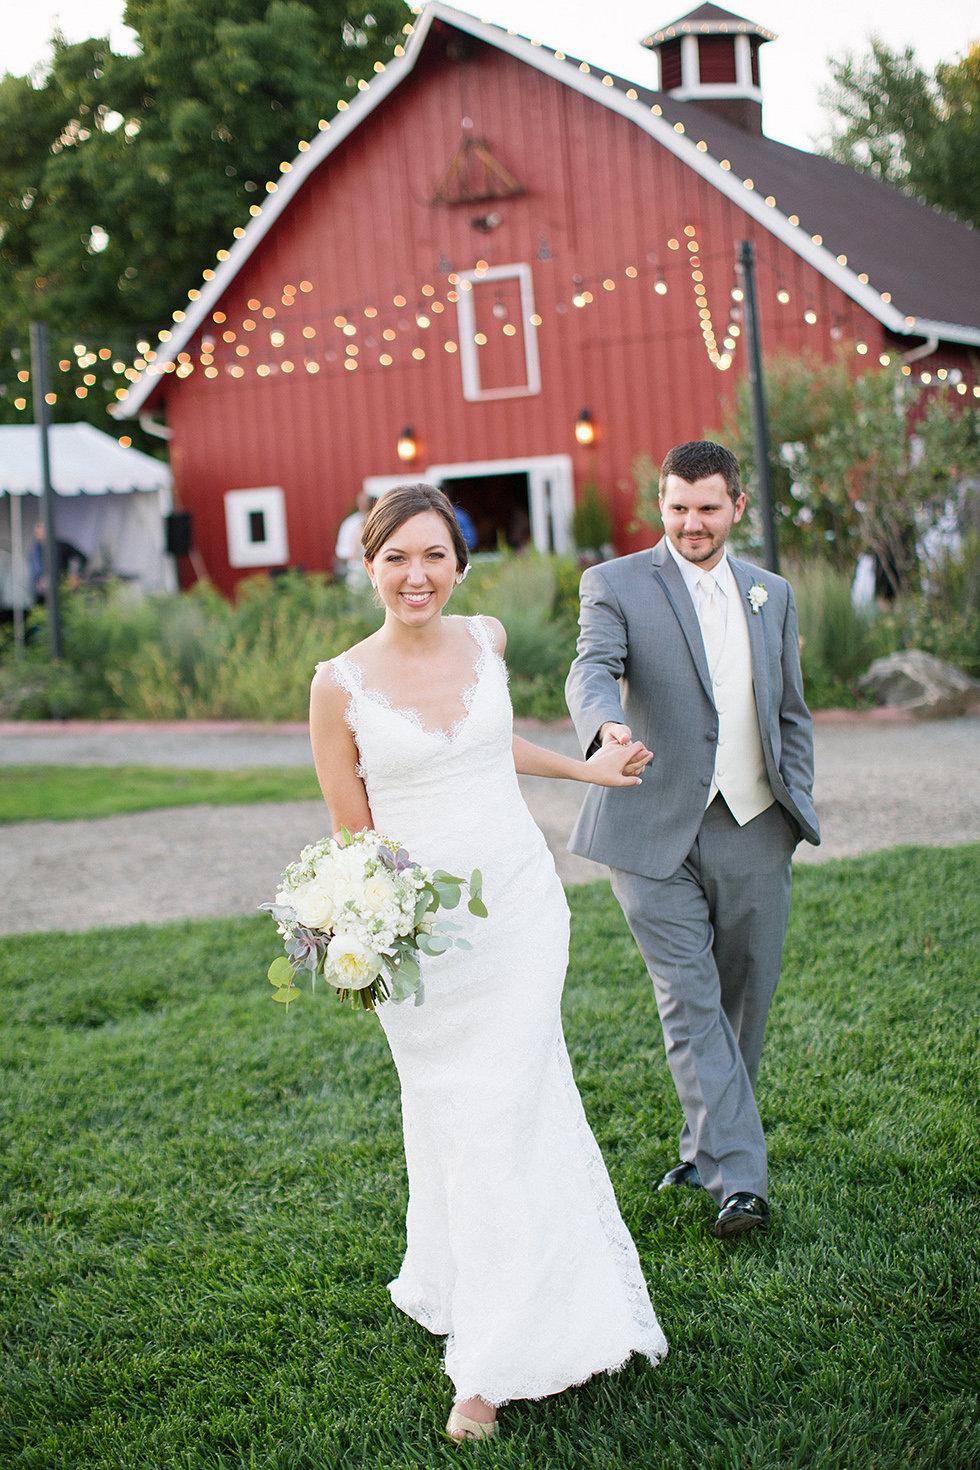 View More: http://jackiecooperphoto.pass.us/jillandbryce